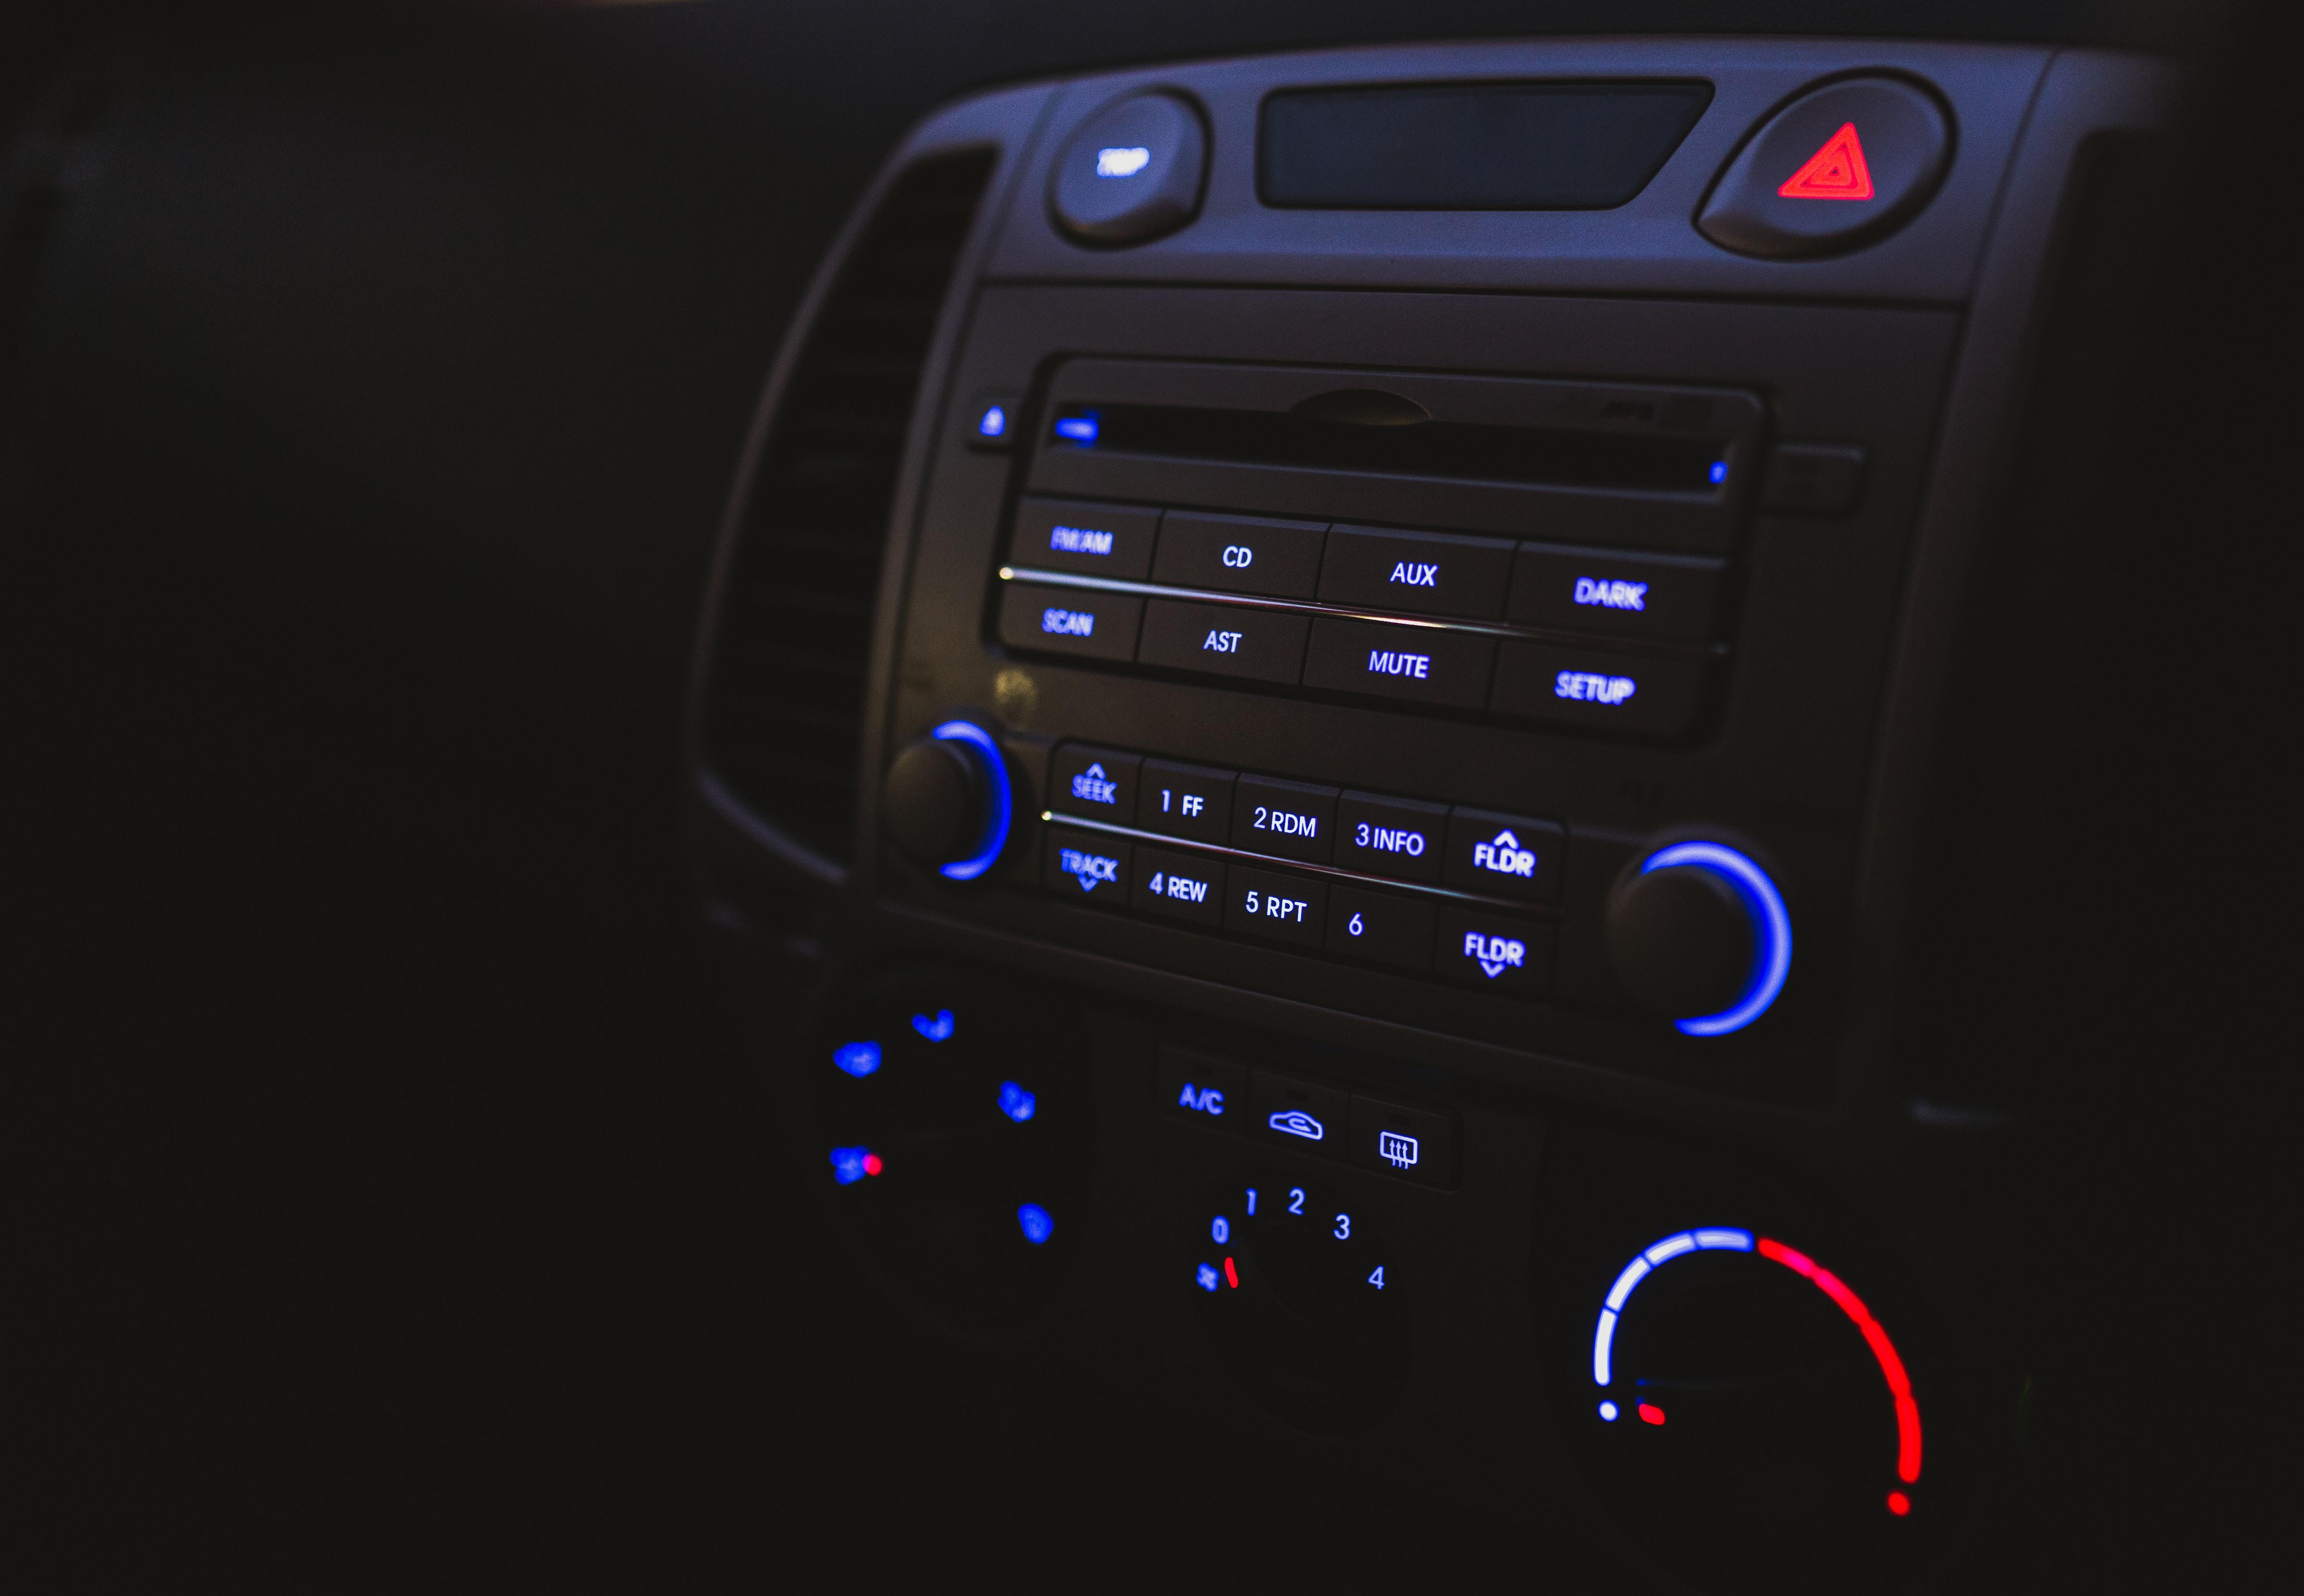 vehicle stereo turned on